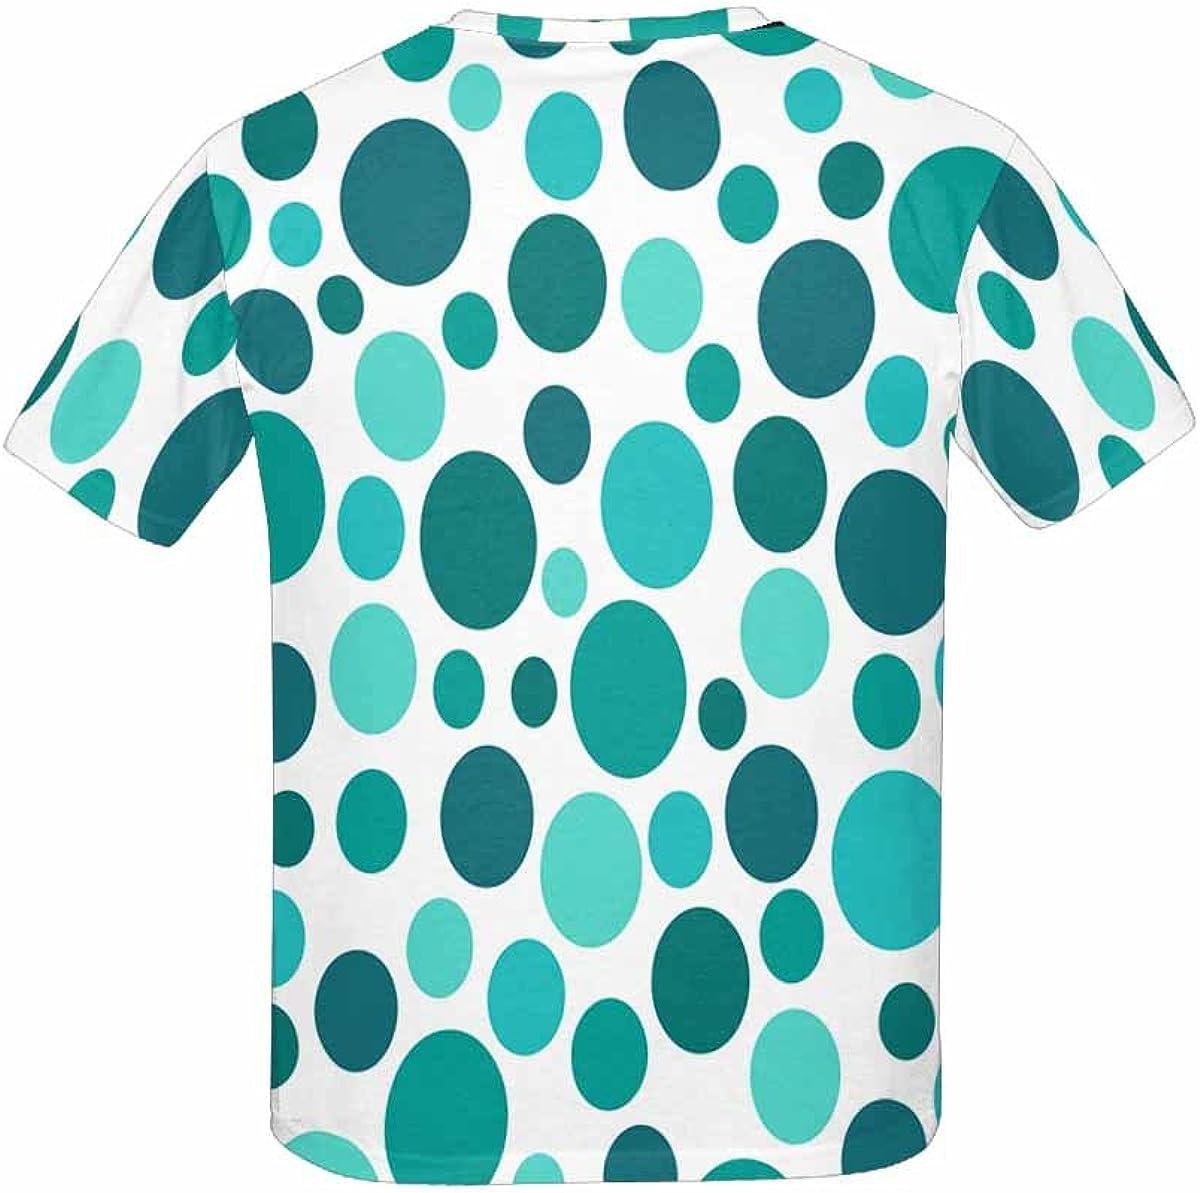 INTERESTPRINT Kids T-Shirts Polka Dot Pattern XS-XL